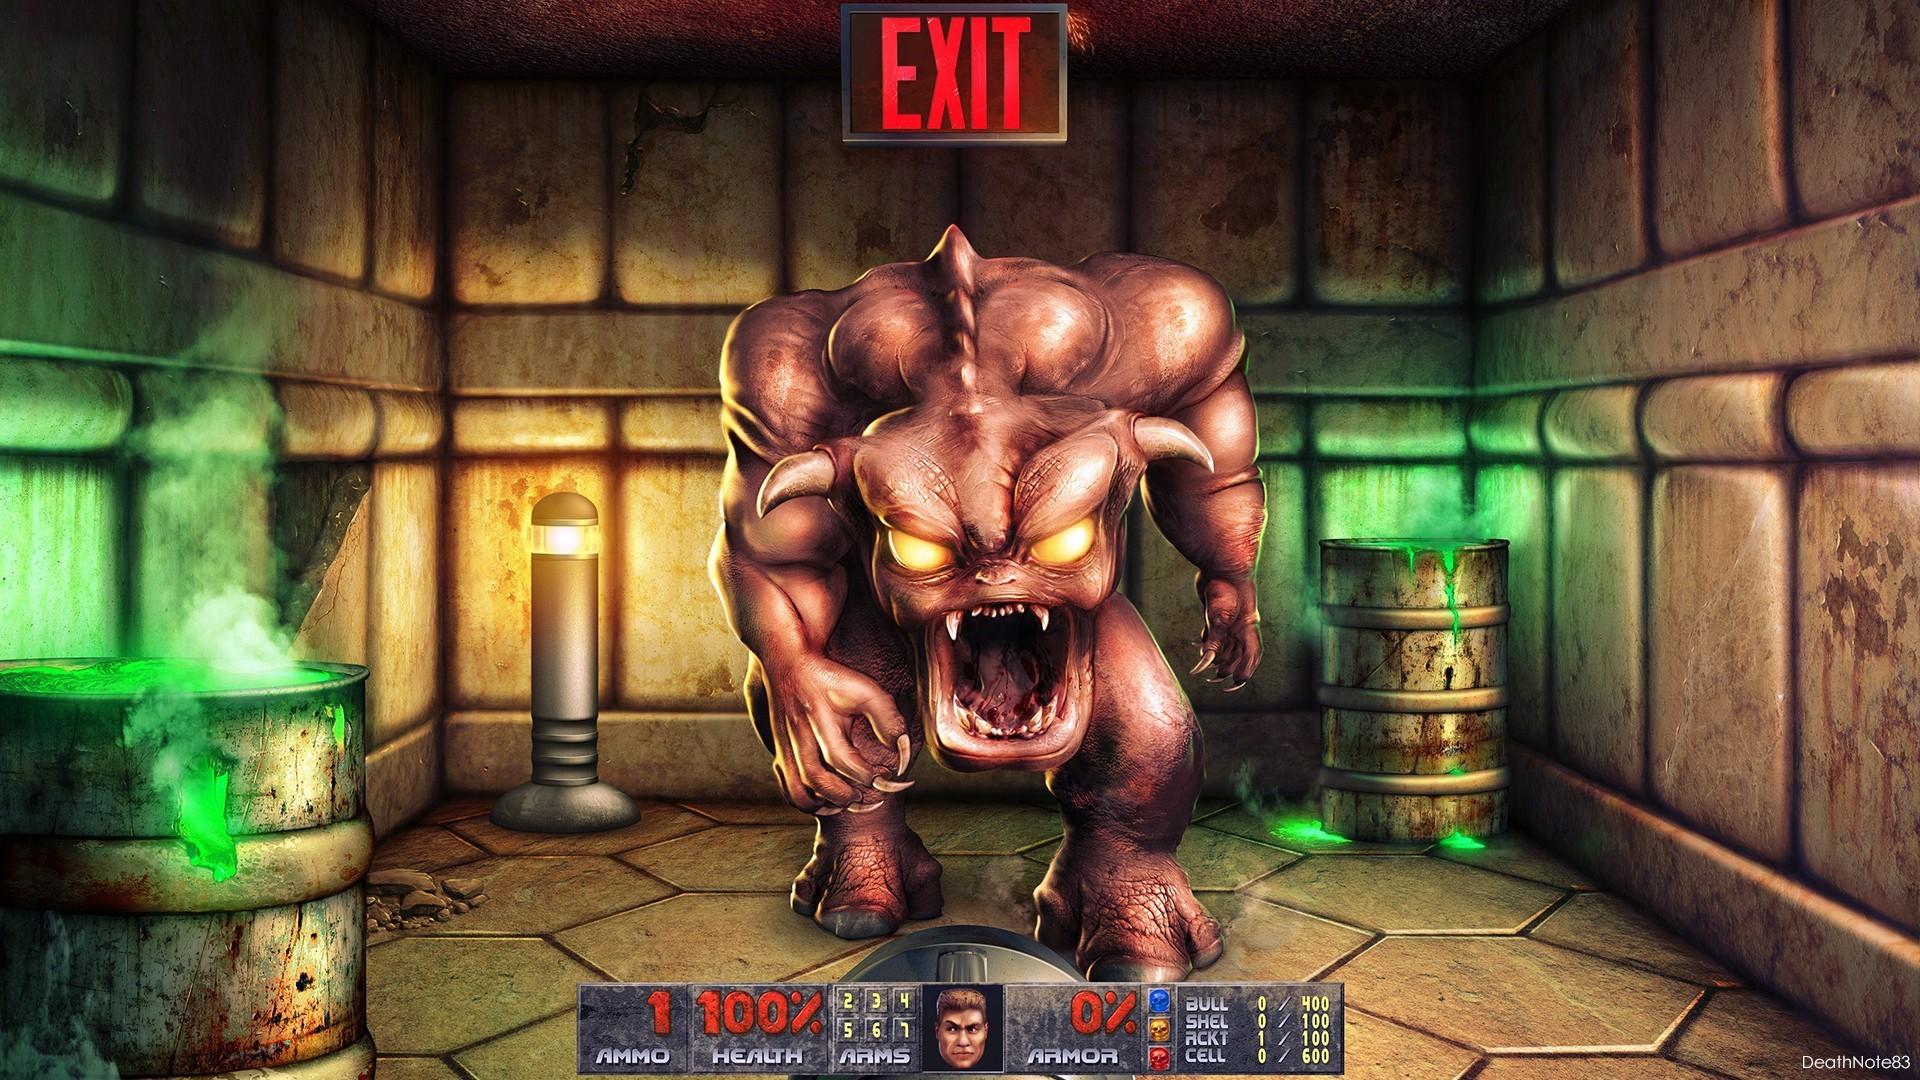 Doom fantasy art retro games game FPP wallpaper | | 205412 |  WallpaperUP